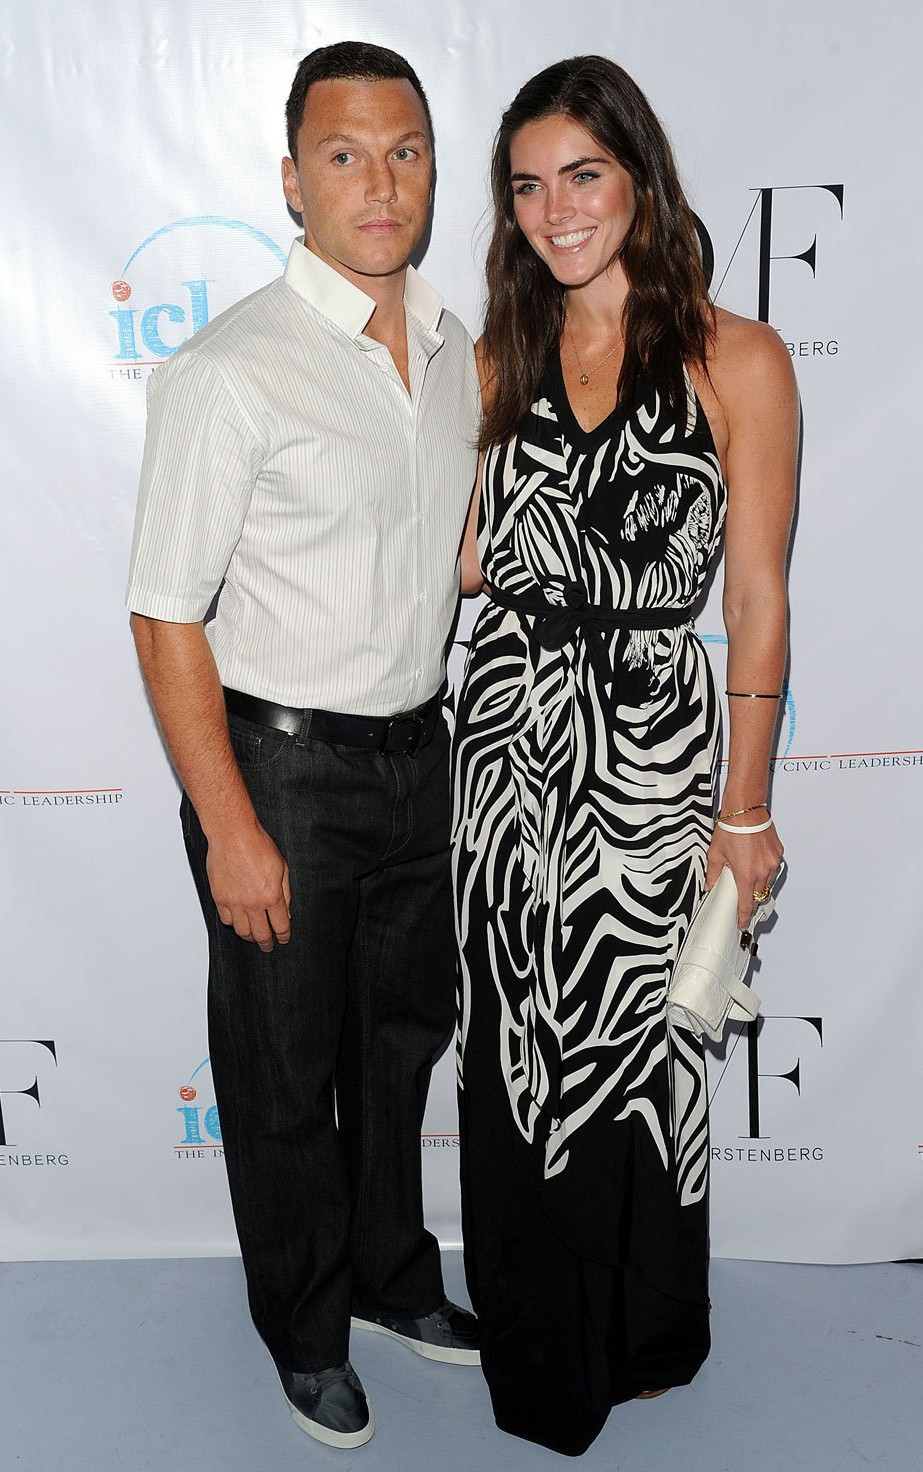 Hilary rhoda dating mark sanchez